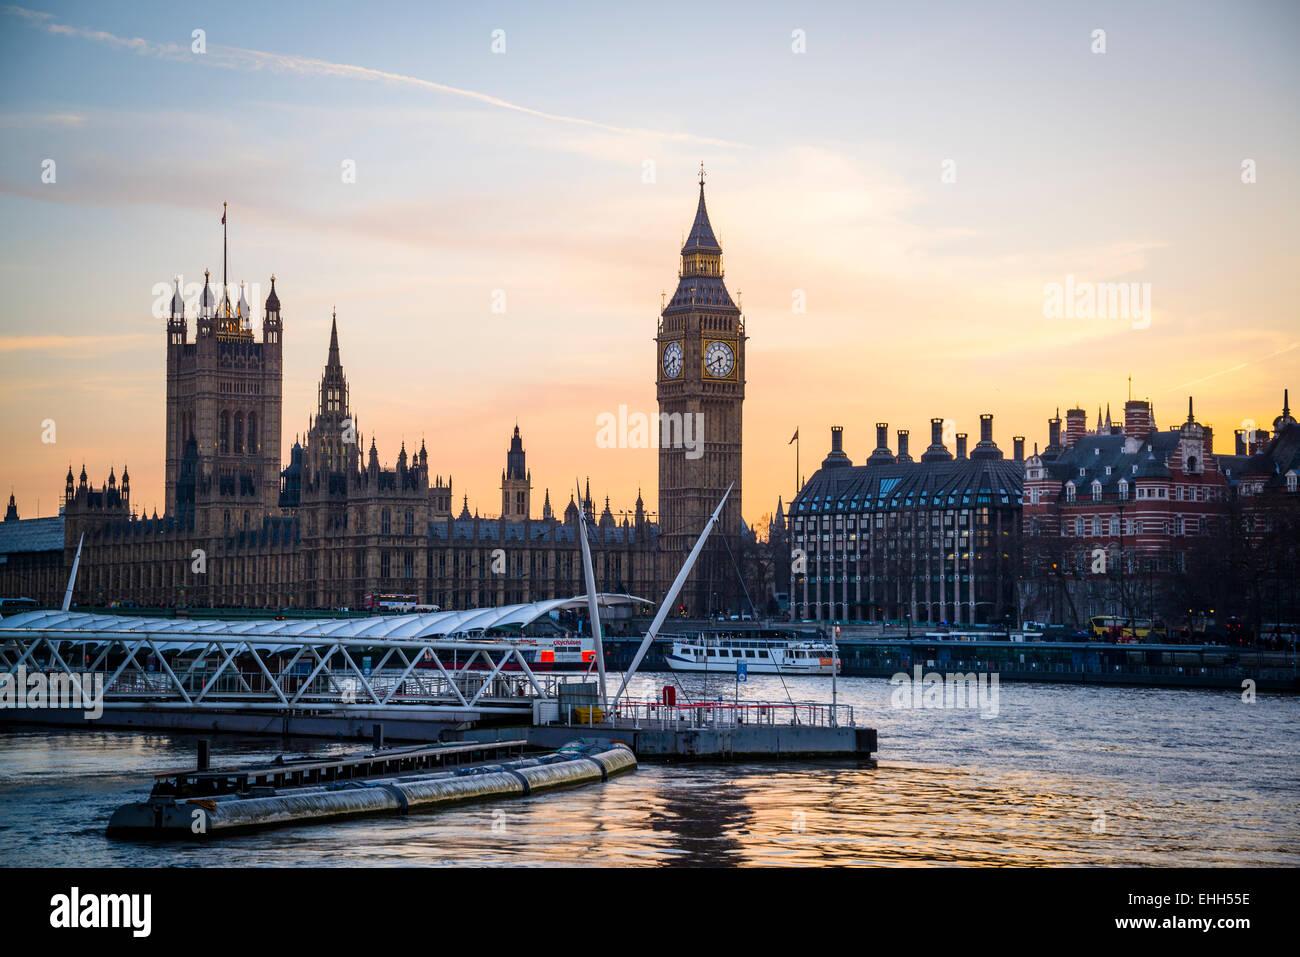 Big Ben und die Houses of Parliament bei Dämmerung, London, England, Uk Stockbild